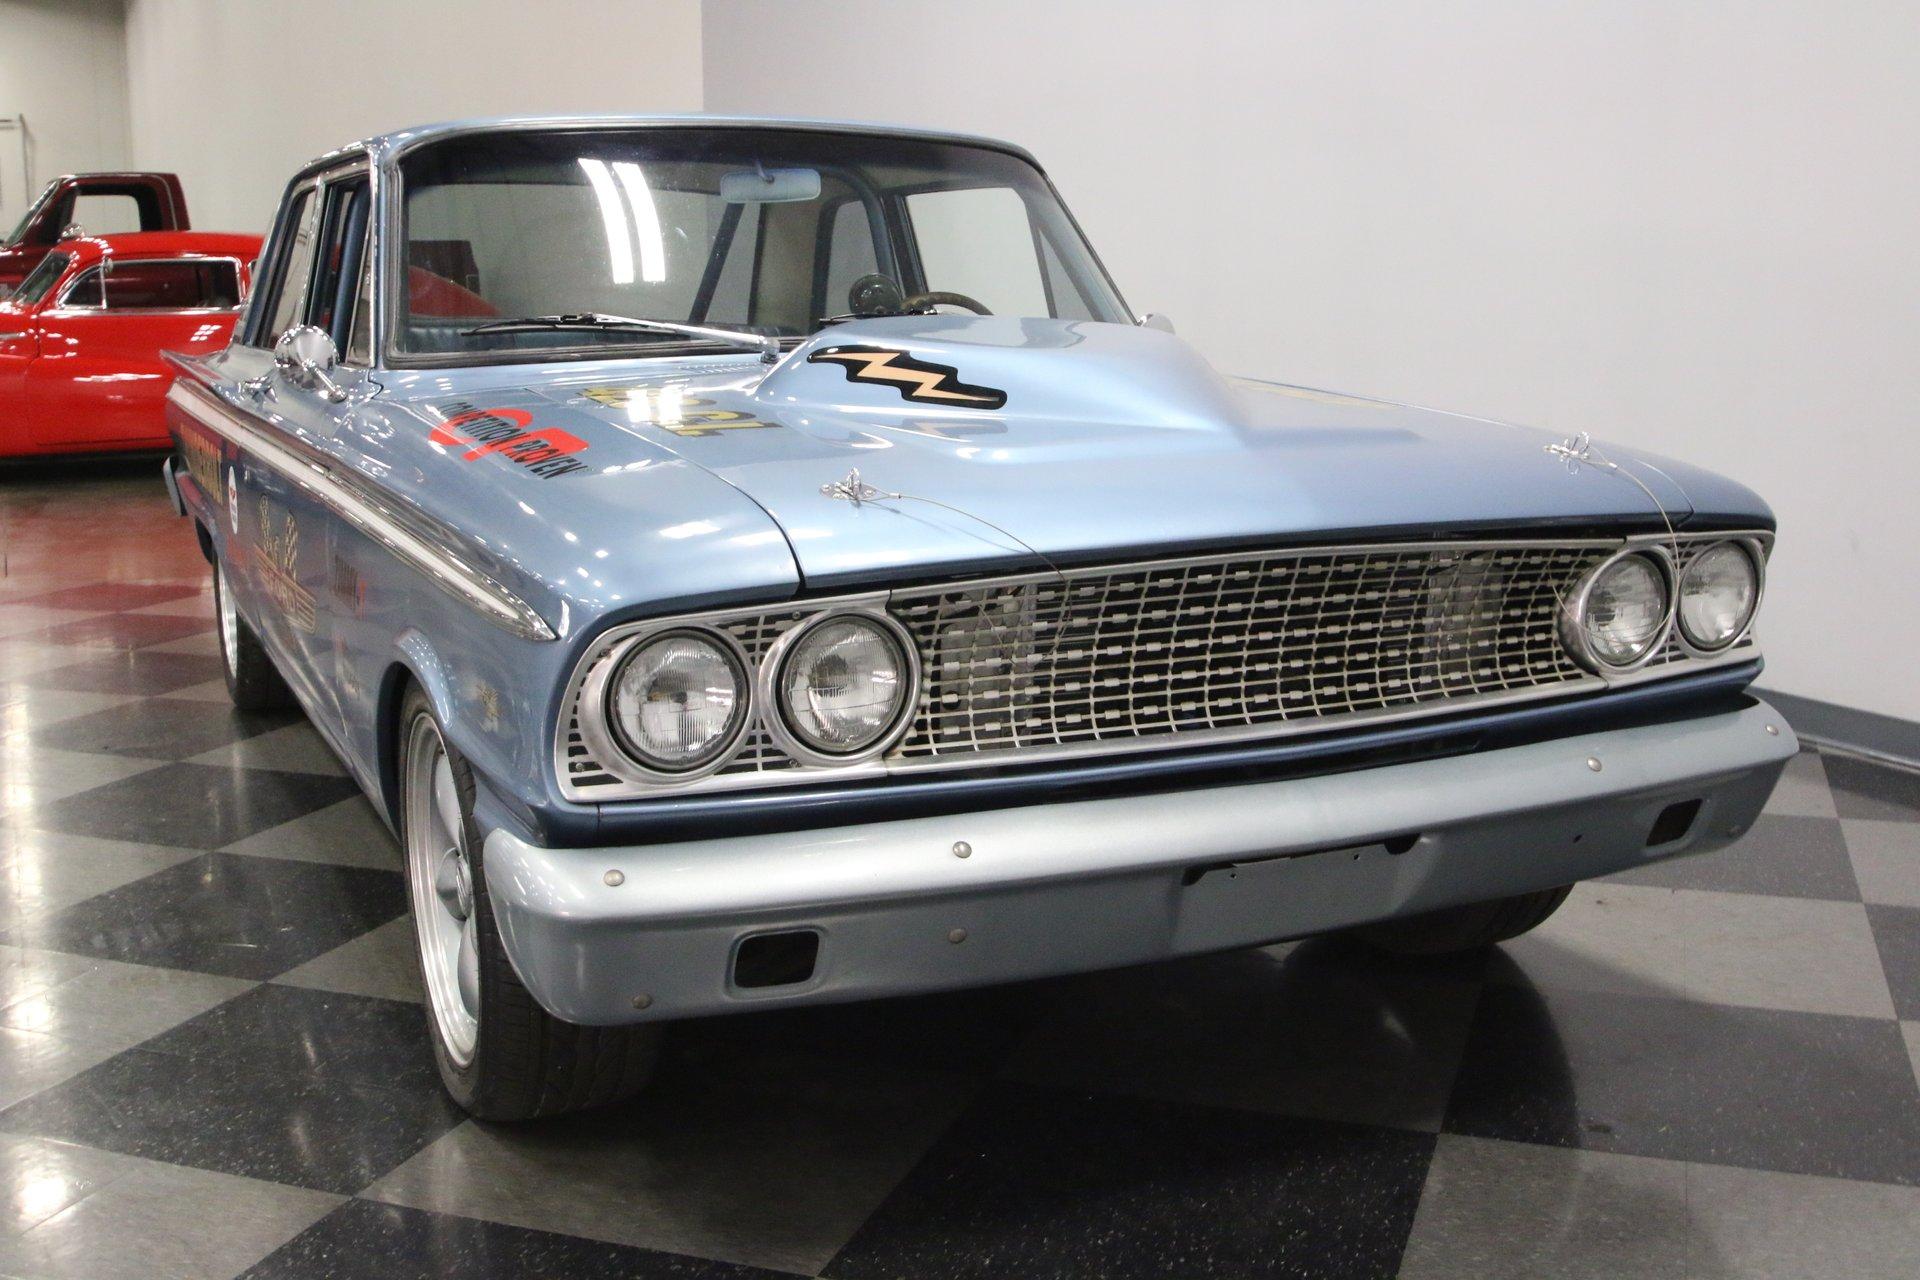 1963 Ford Fairlane 500 | Streetside Classics - The Nation's